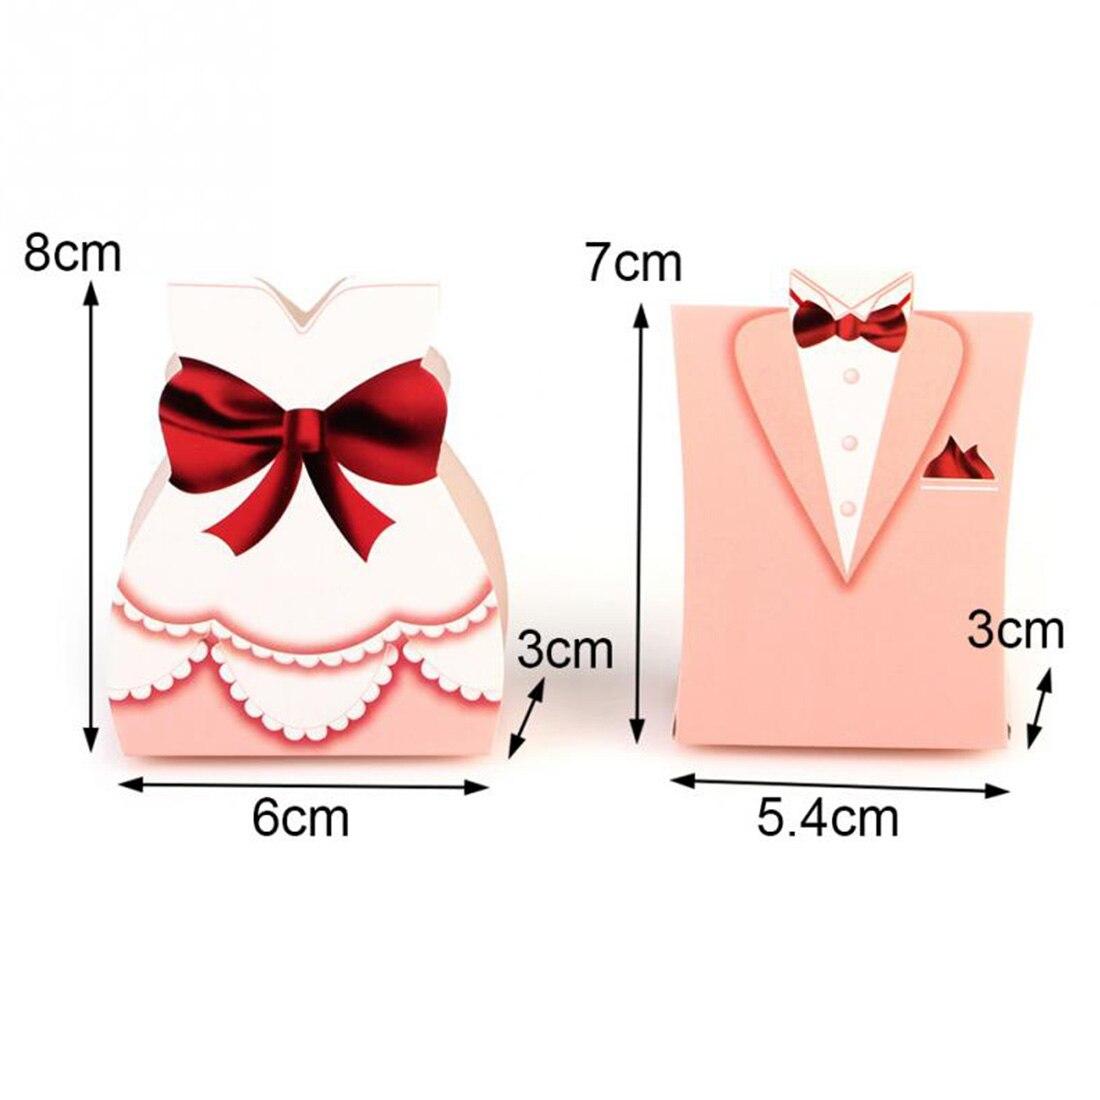 Hot sale50Pcs Fashion Pink Bride Groom Tuxedo Dress Gown Shape ...